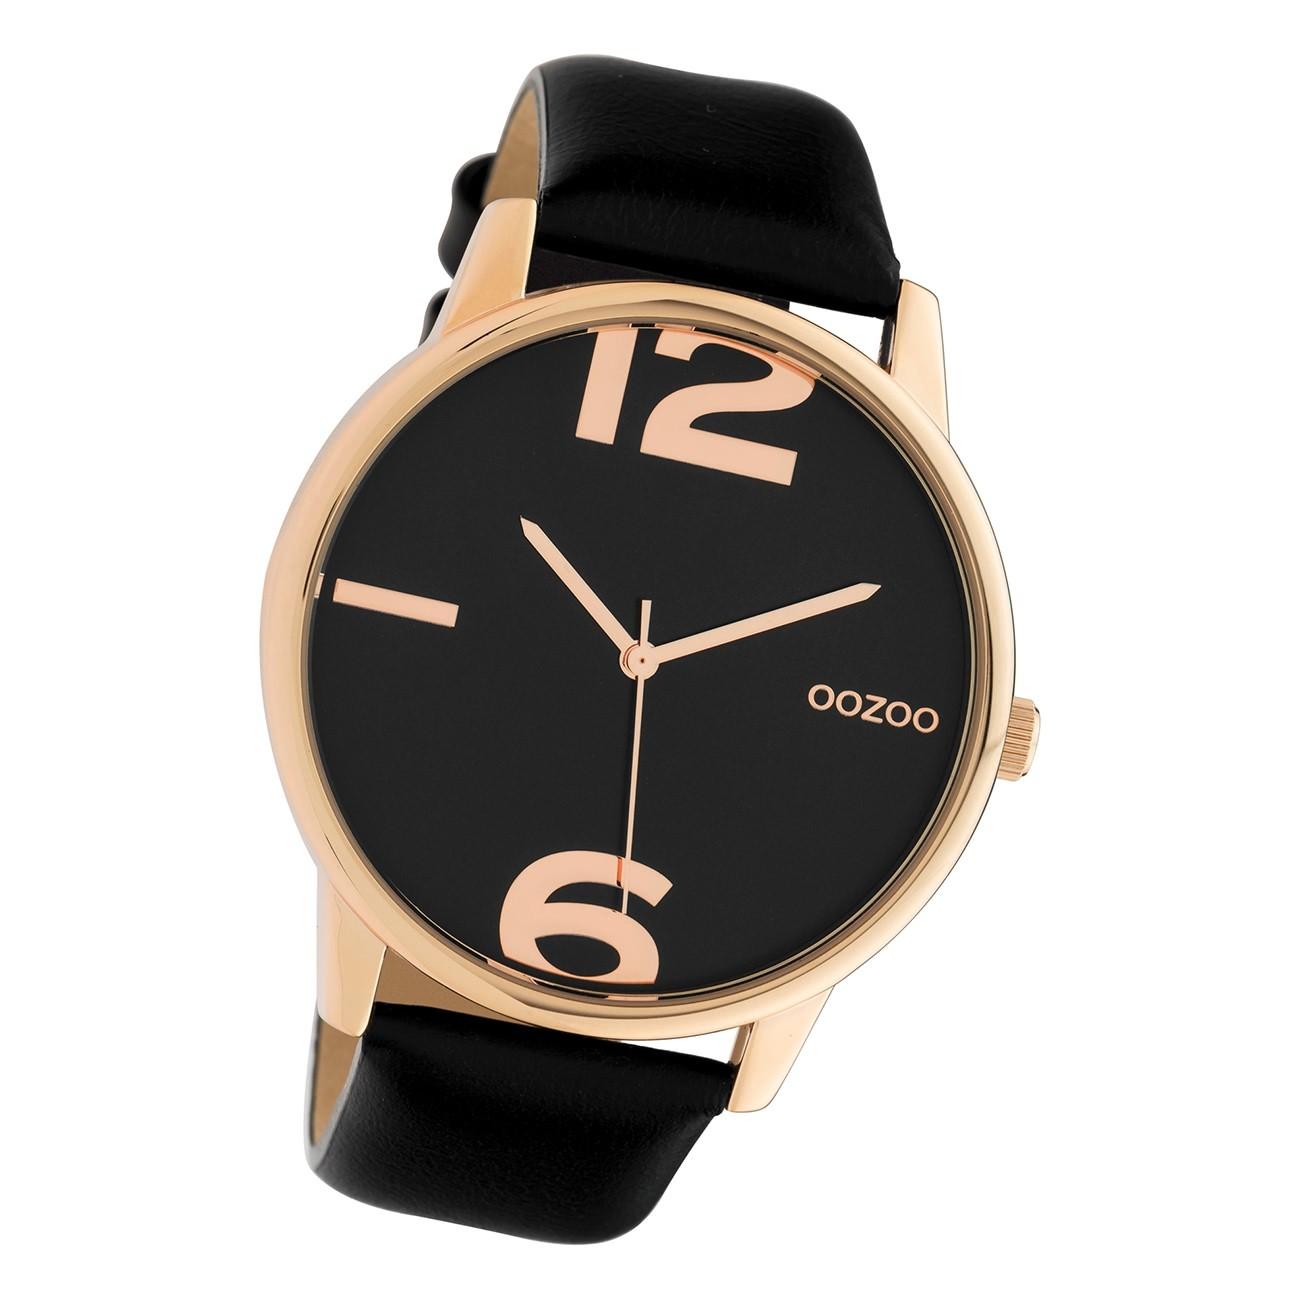 Oozoo Damen Armbanduhr Timepieces C10374 Analog Leder schwarz UOC10374